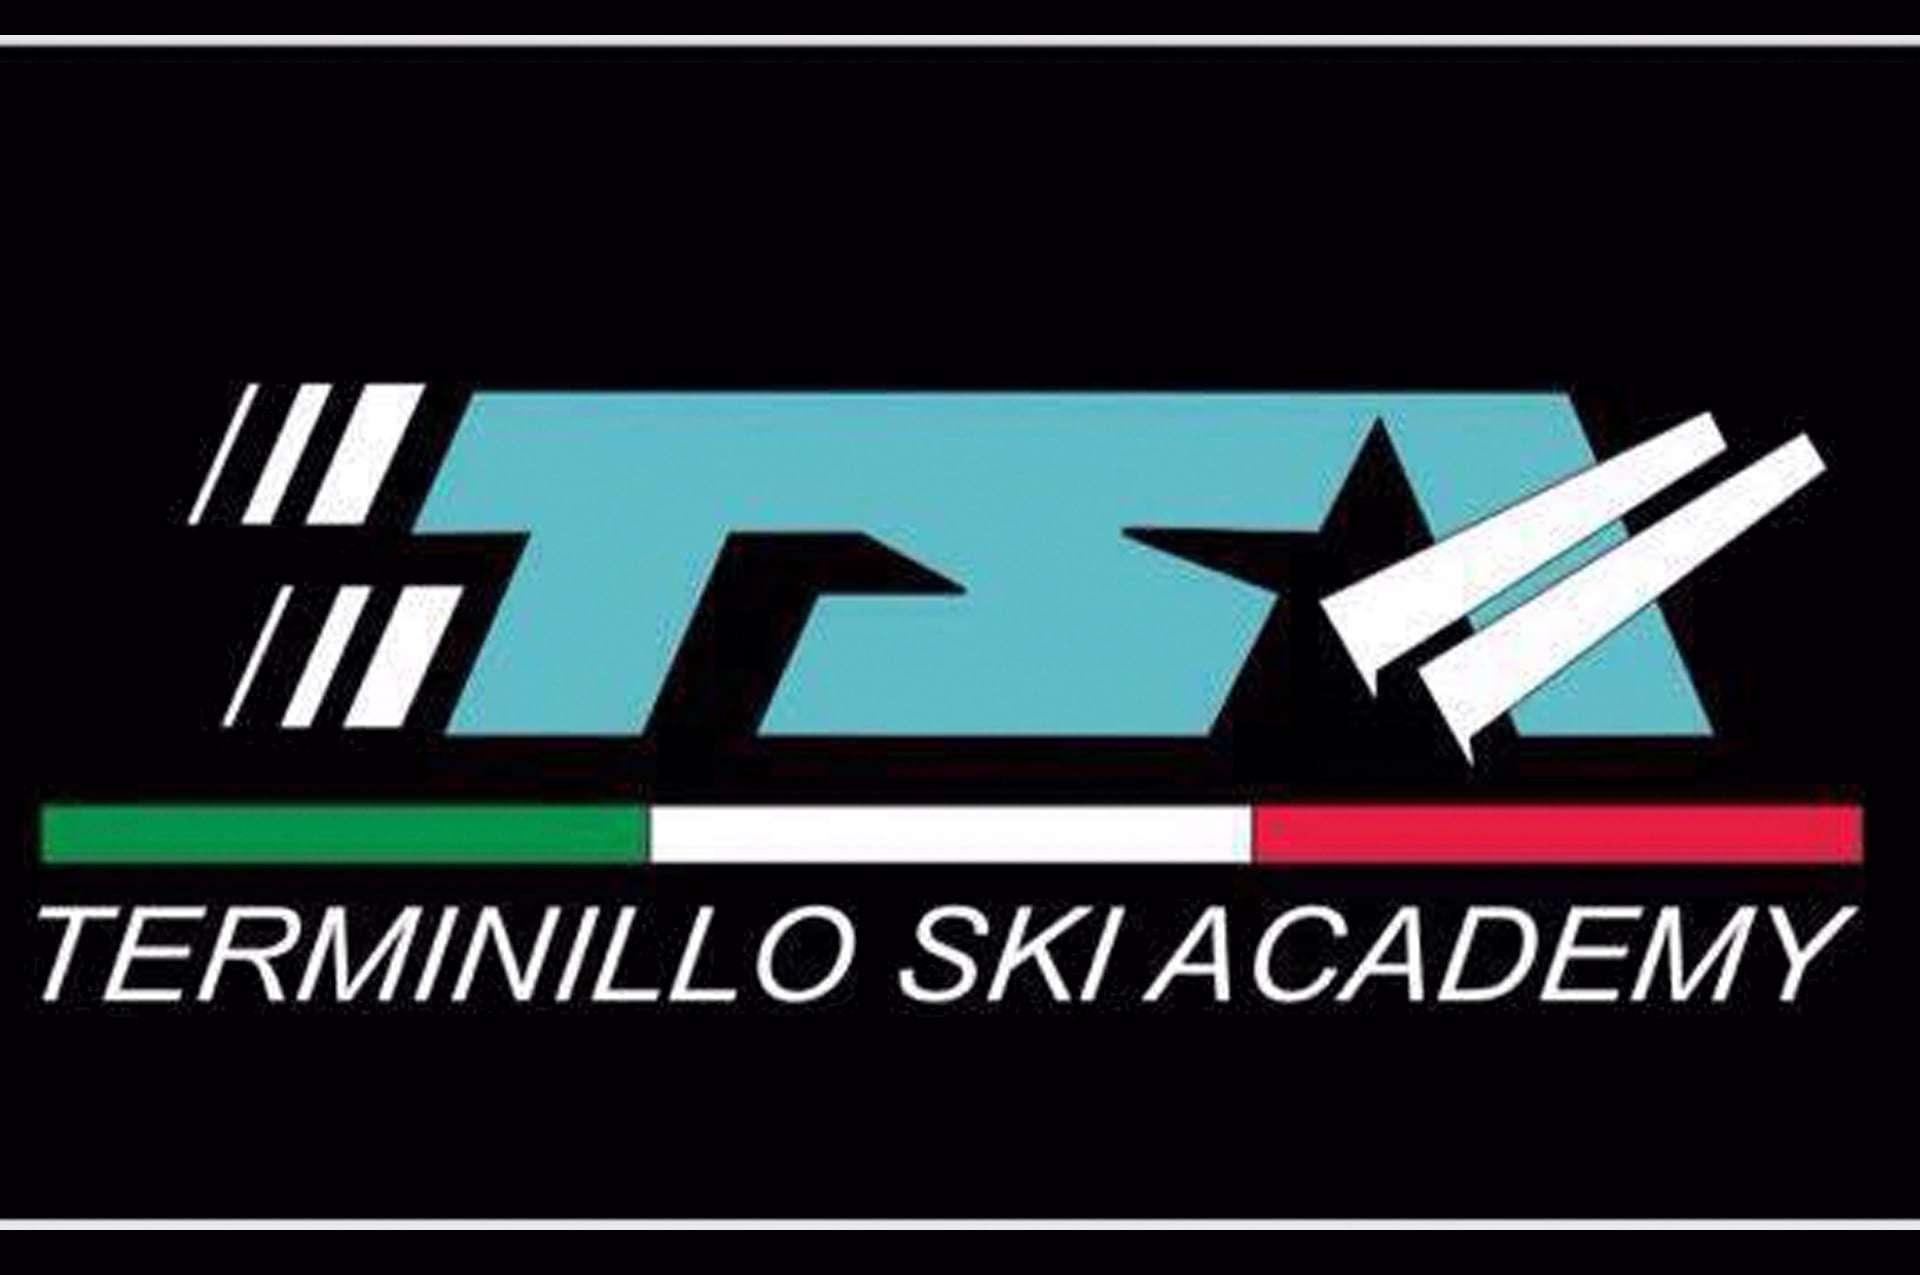 terminillo ski academy